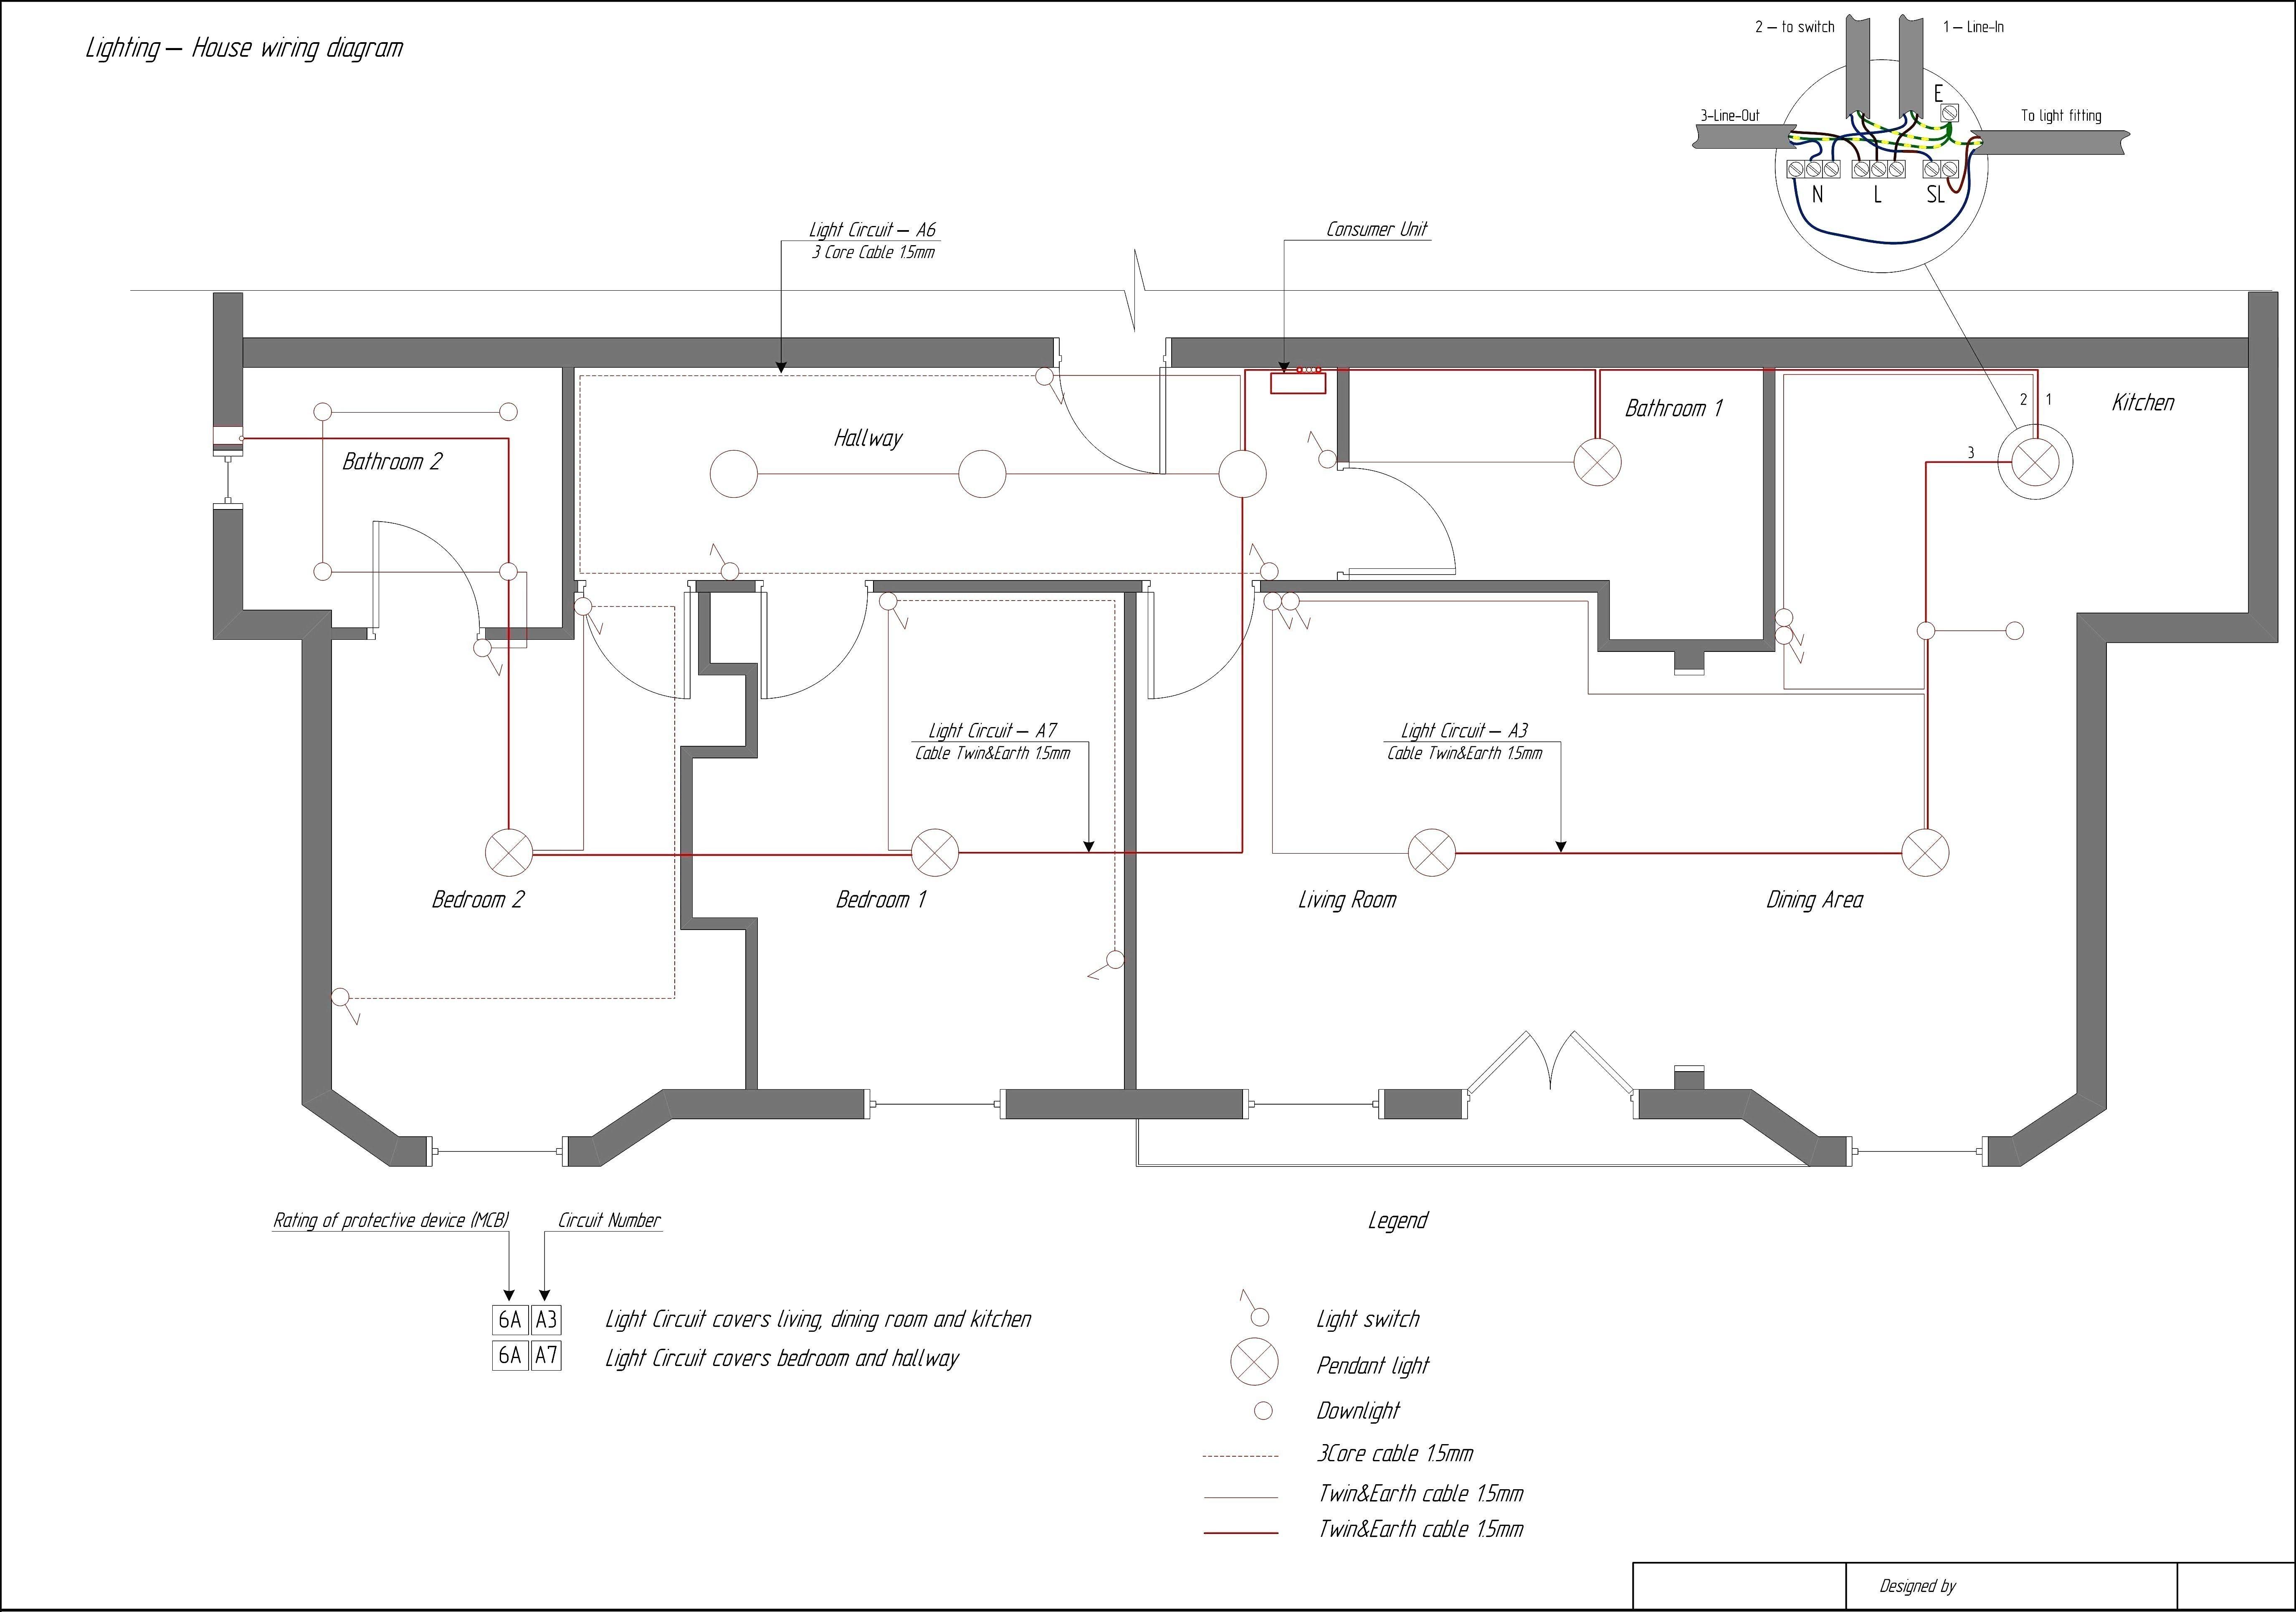 New Wiring Diagram Program Diagram Wiringdiagram Diagramming Diagramm Visuals Visualisatio House Wiring Electrical Circuit Diagram Home Electrical Wiring